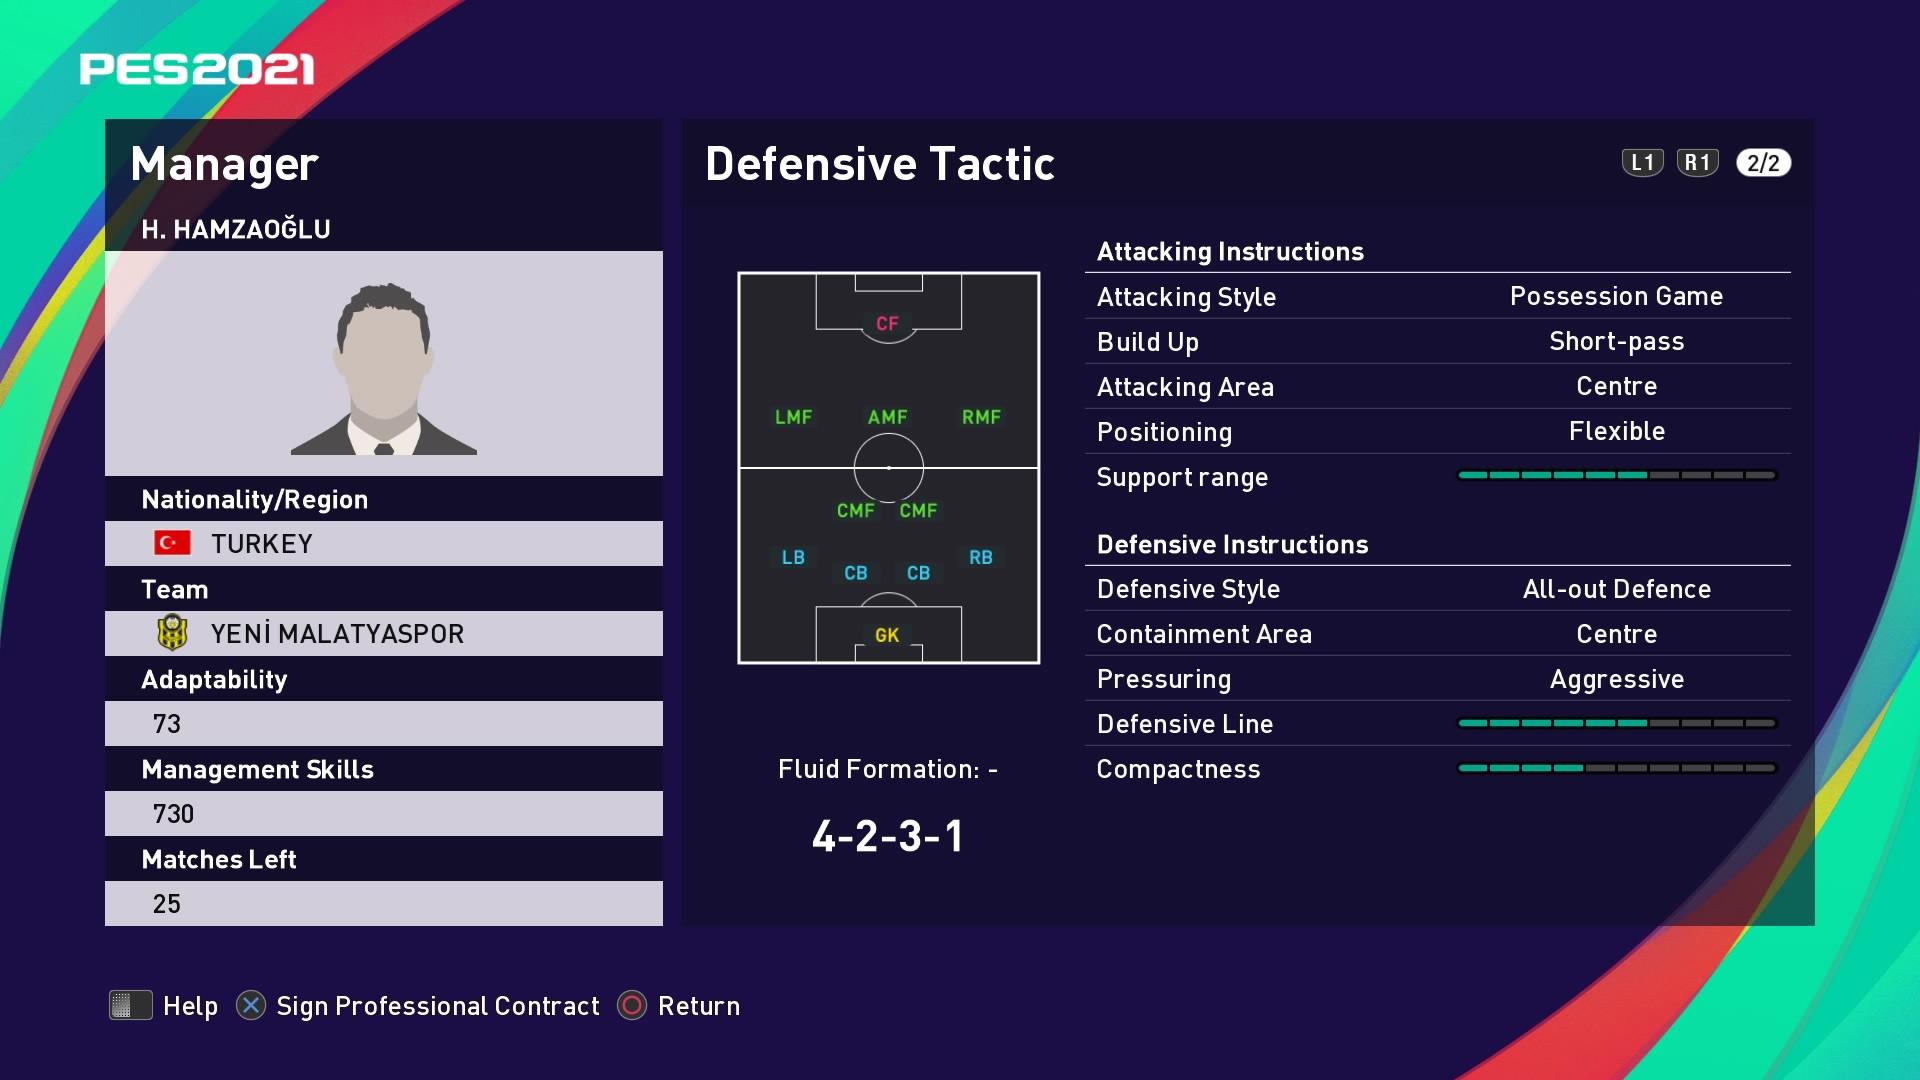 H. Hamzaoğlu (Hamza Hamzaoğlu) Defensive Tactic in PES 2021 myClub